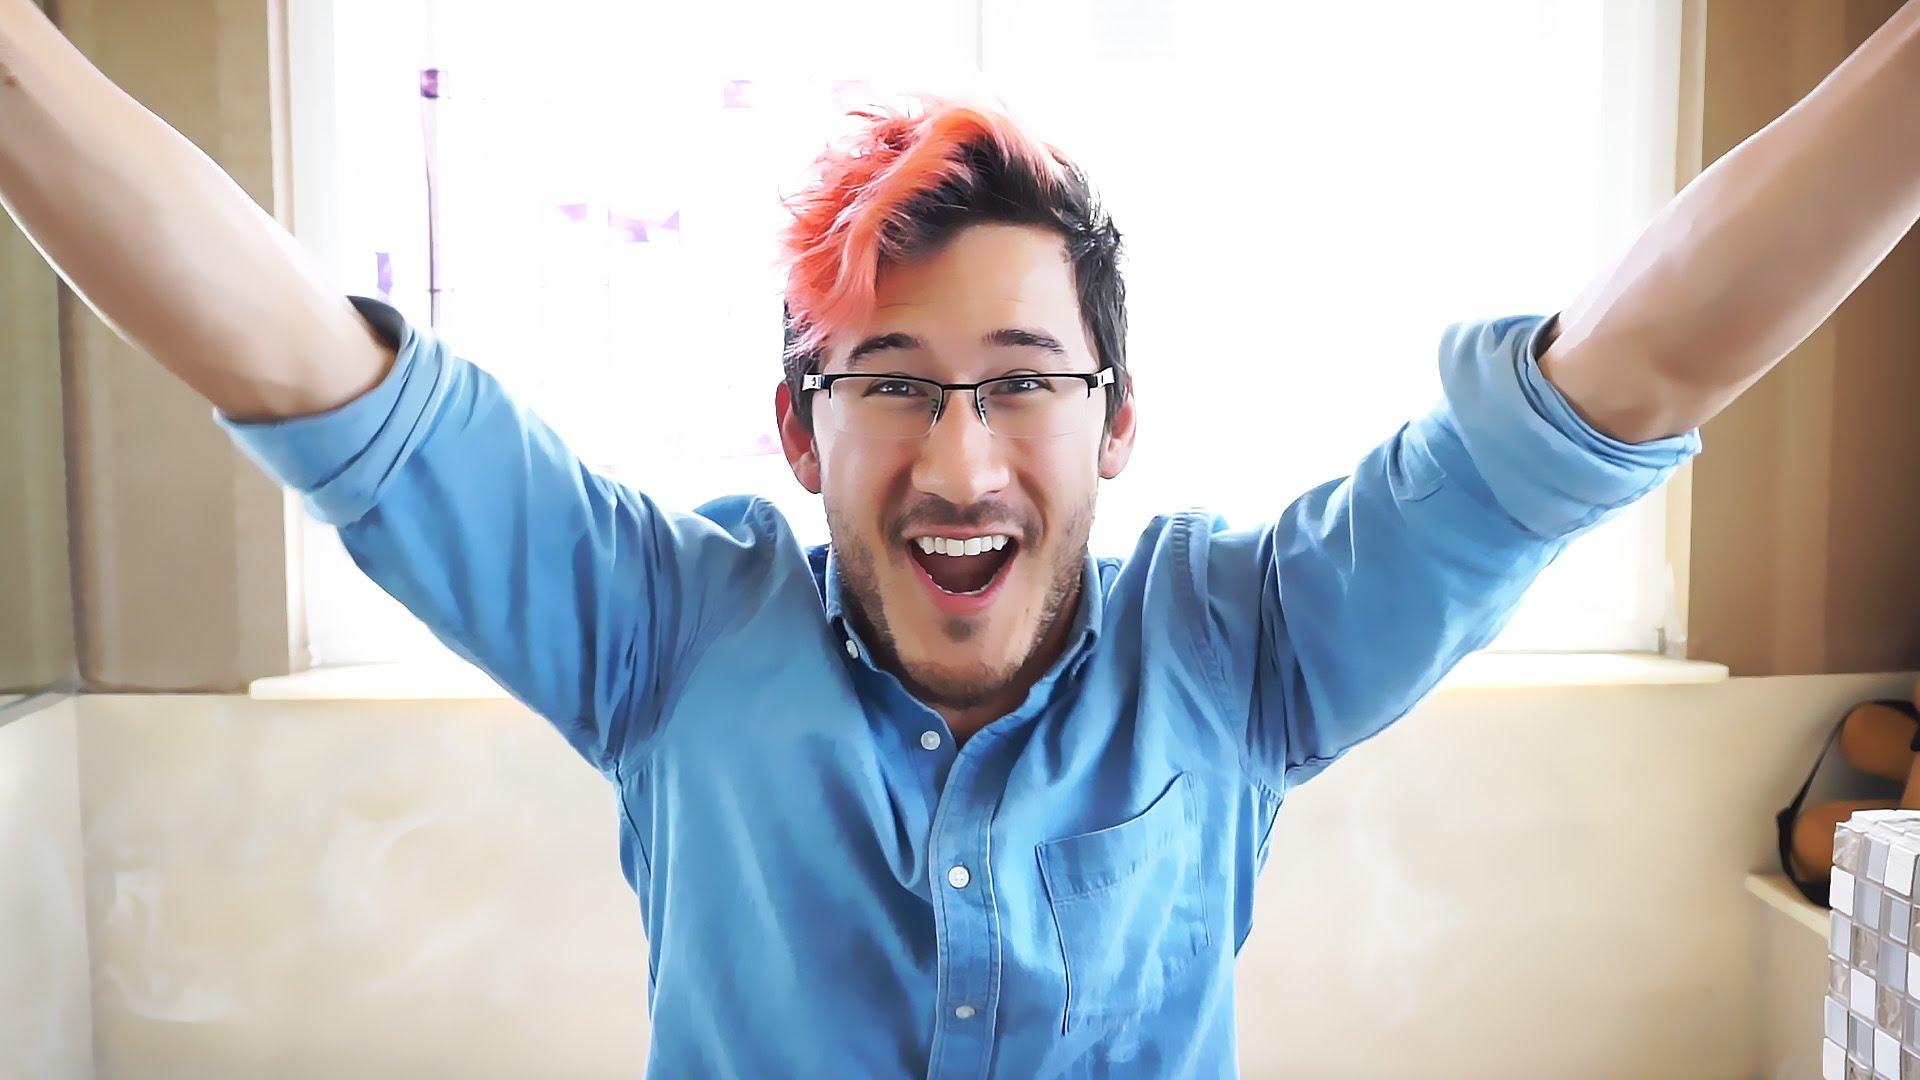 YouTuber Markiplier's Net Worth May Surprise You - Budget ... Markiplier Net Worth